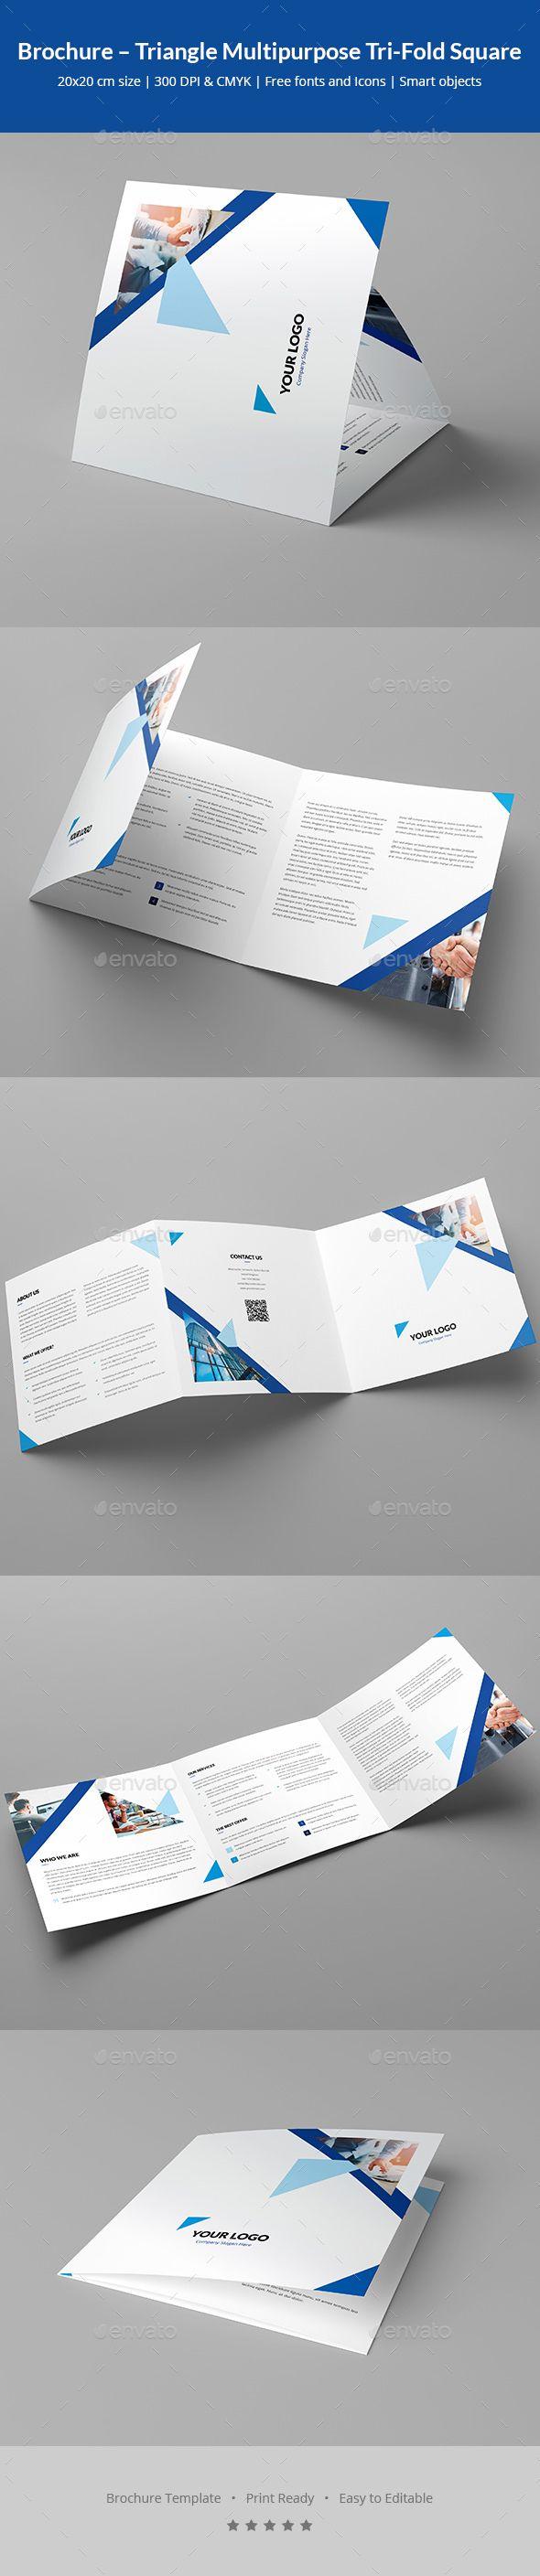 Brochure Triangle Multipurpose Tri Fold Square Brochure Template